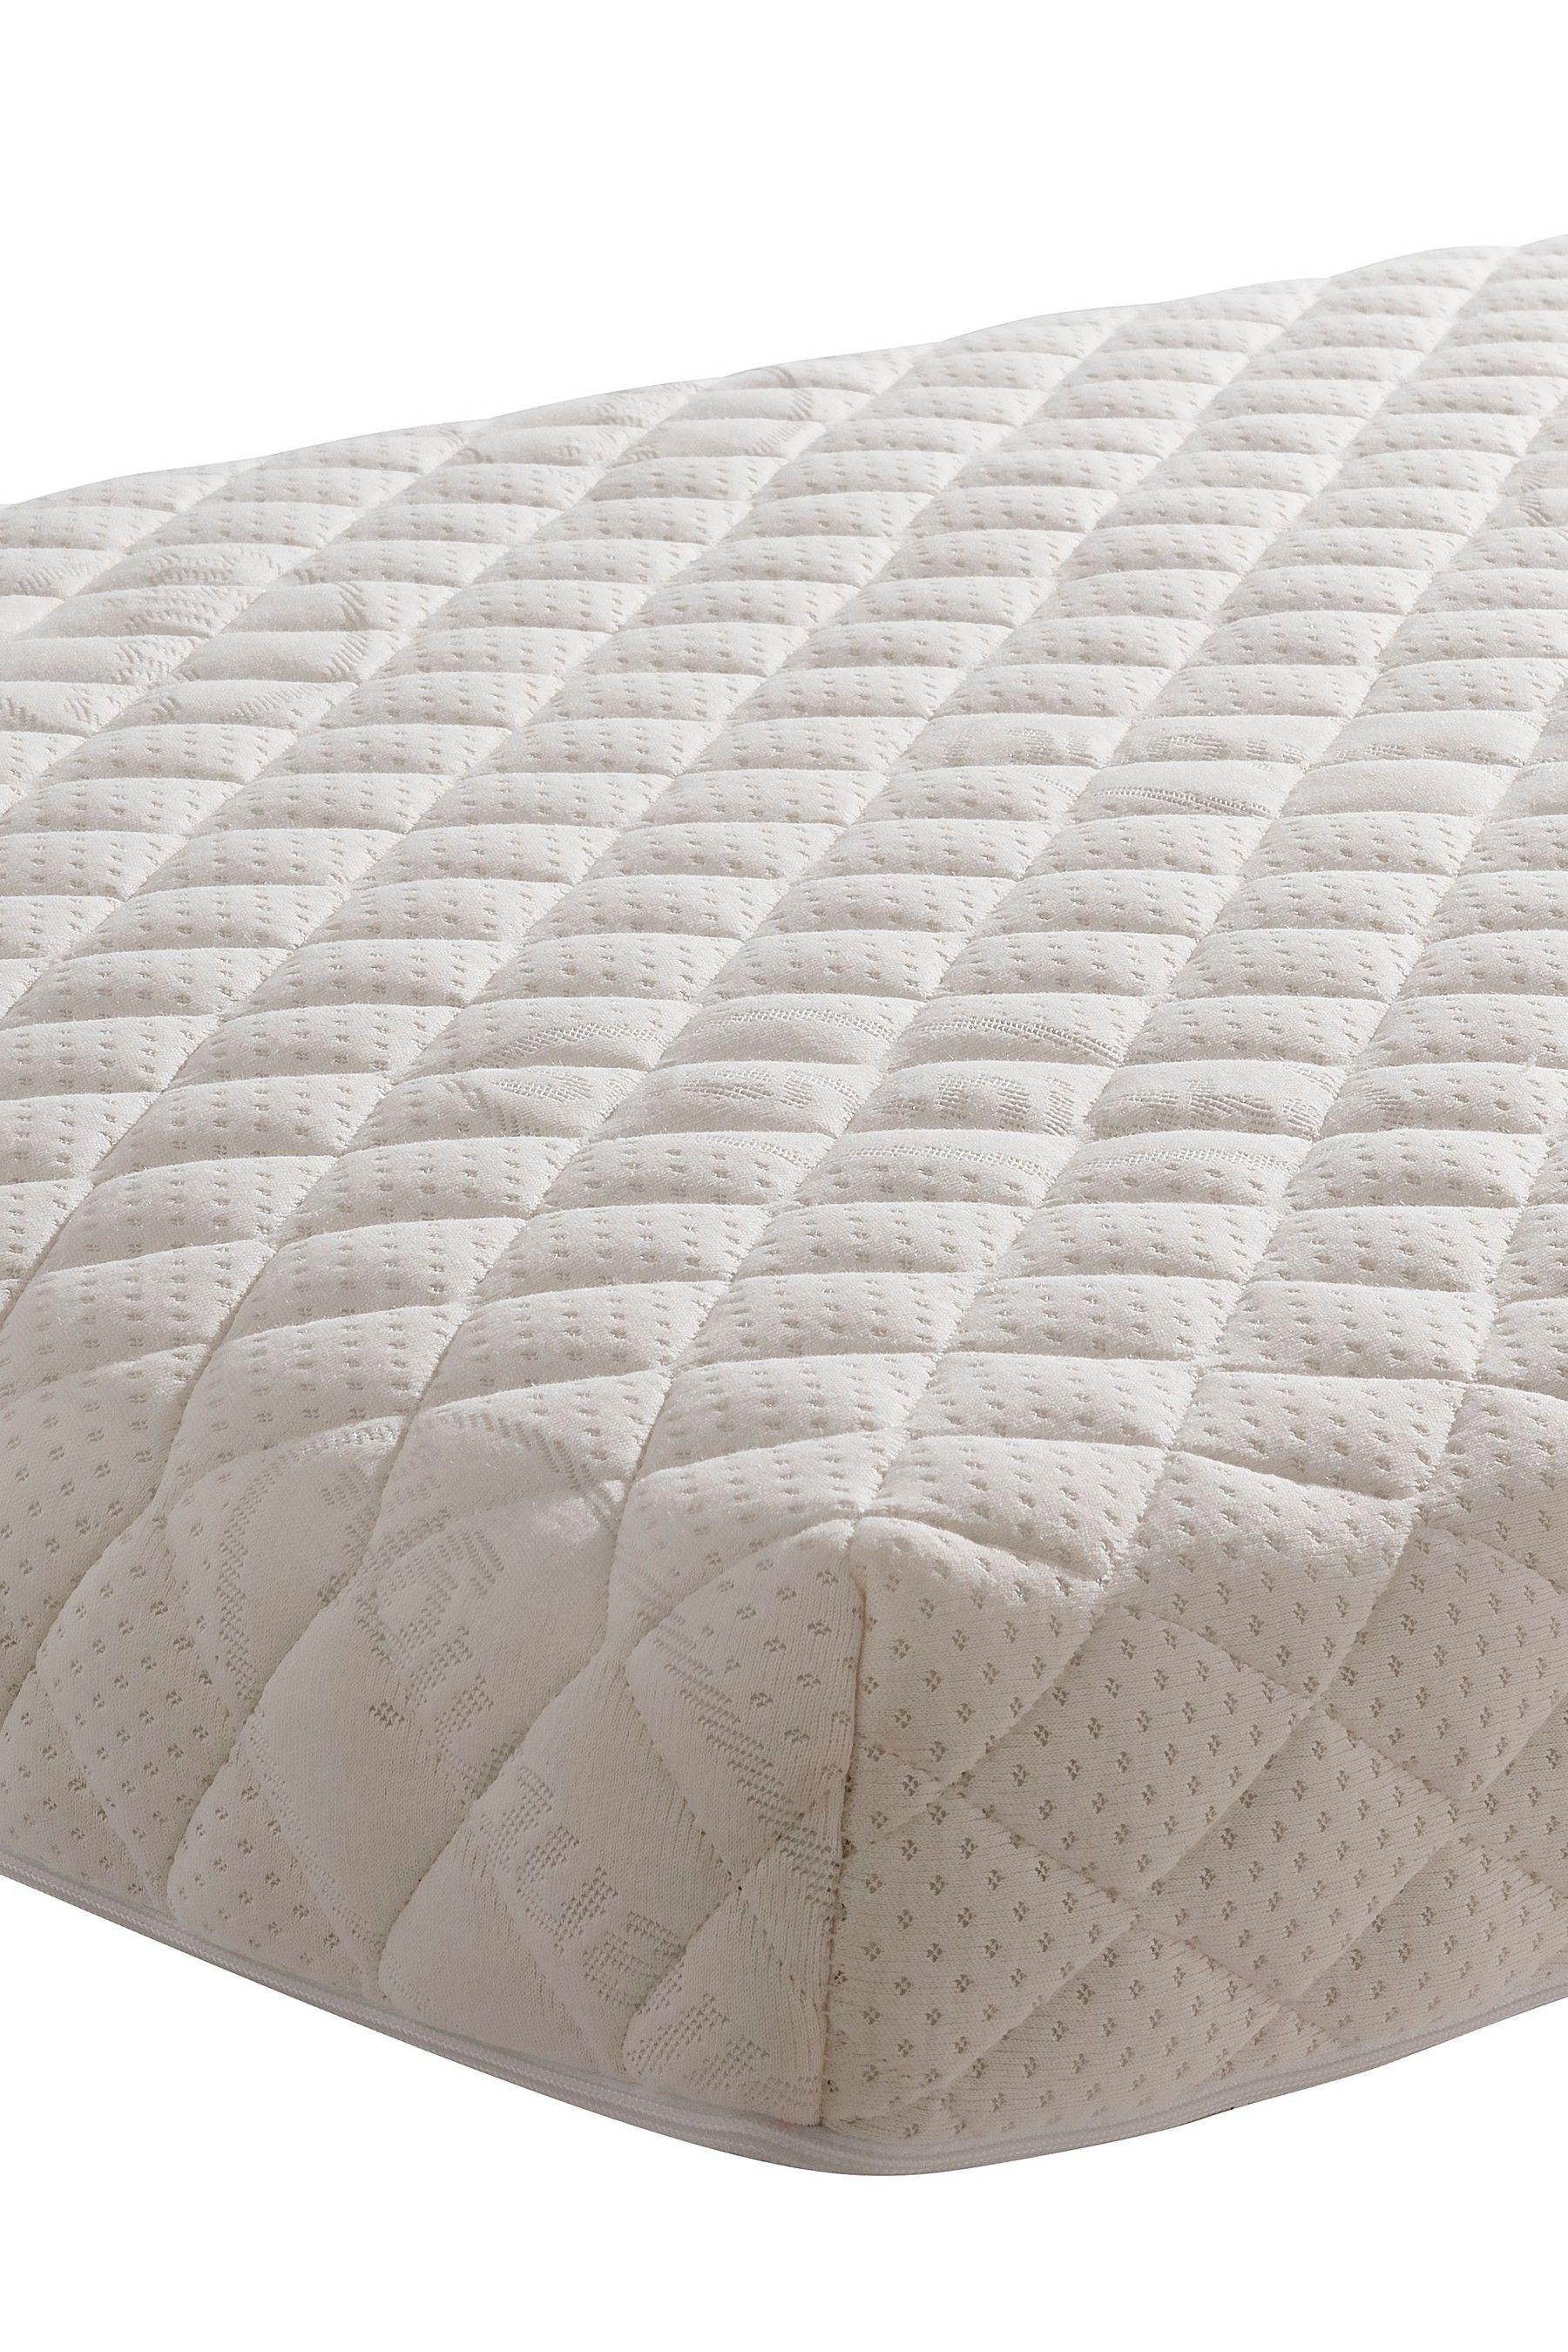 Silentnight Safe Nights Nursery Cot Bed